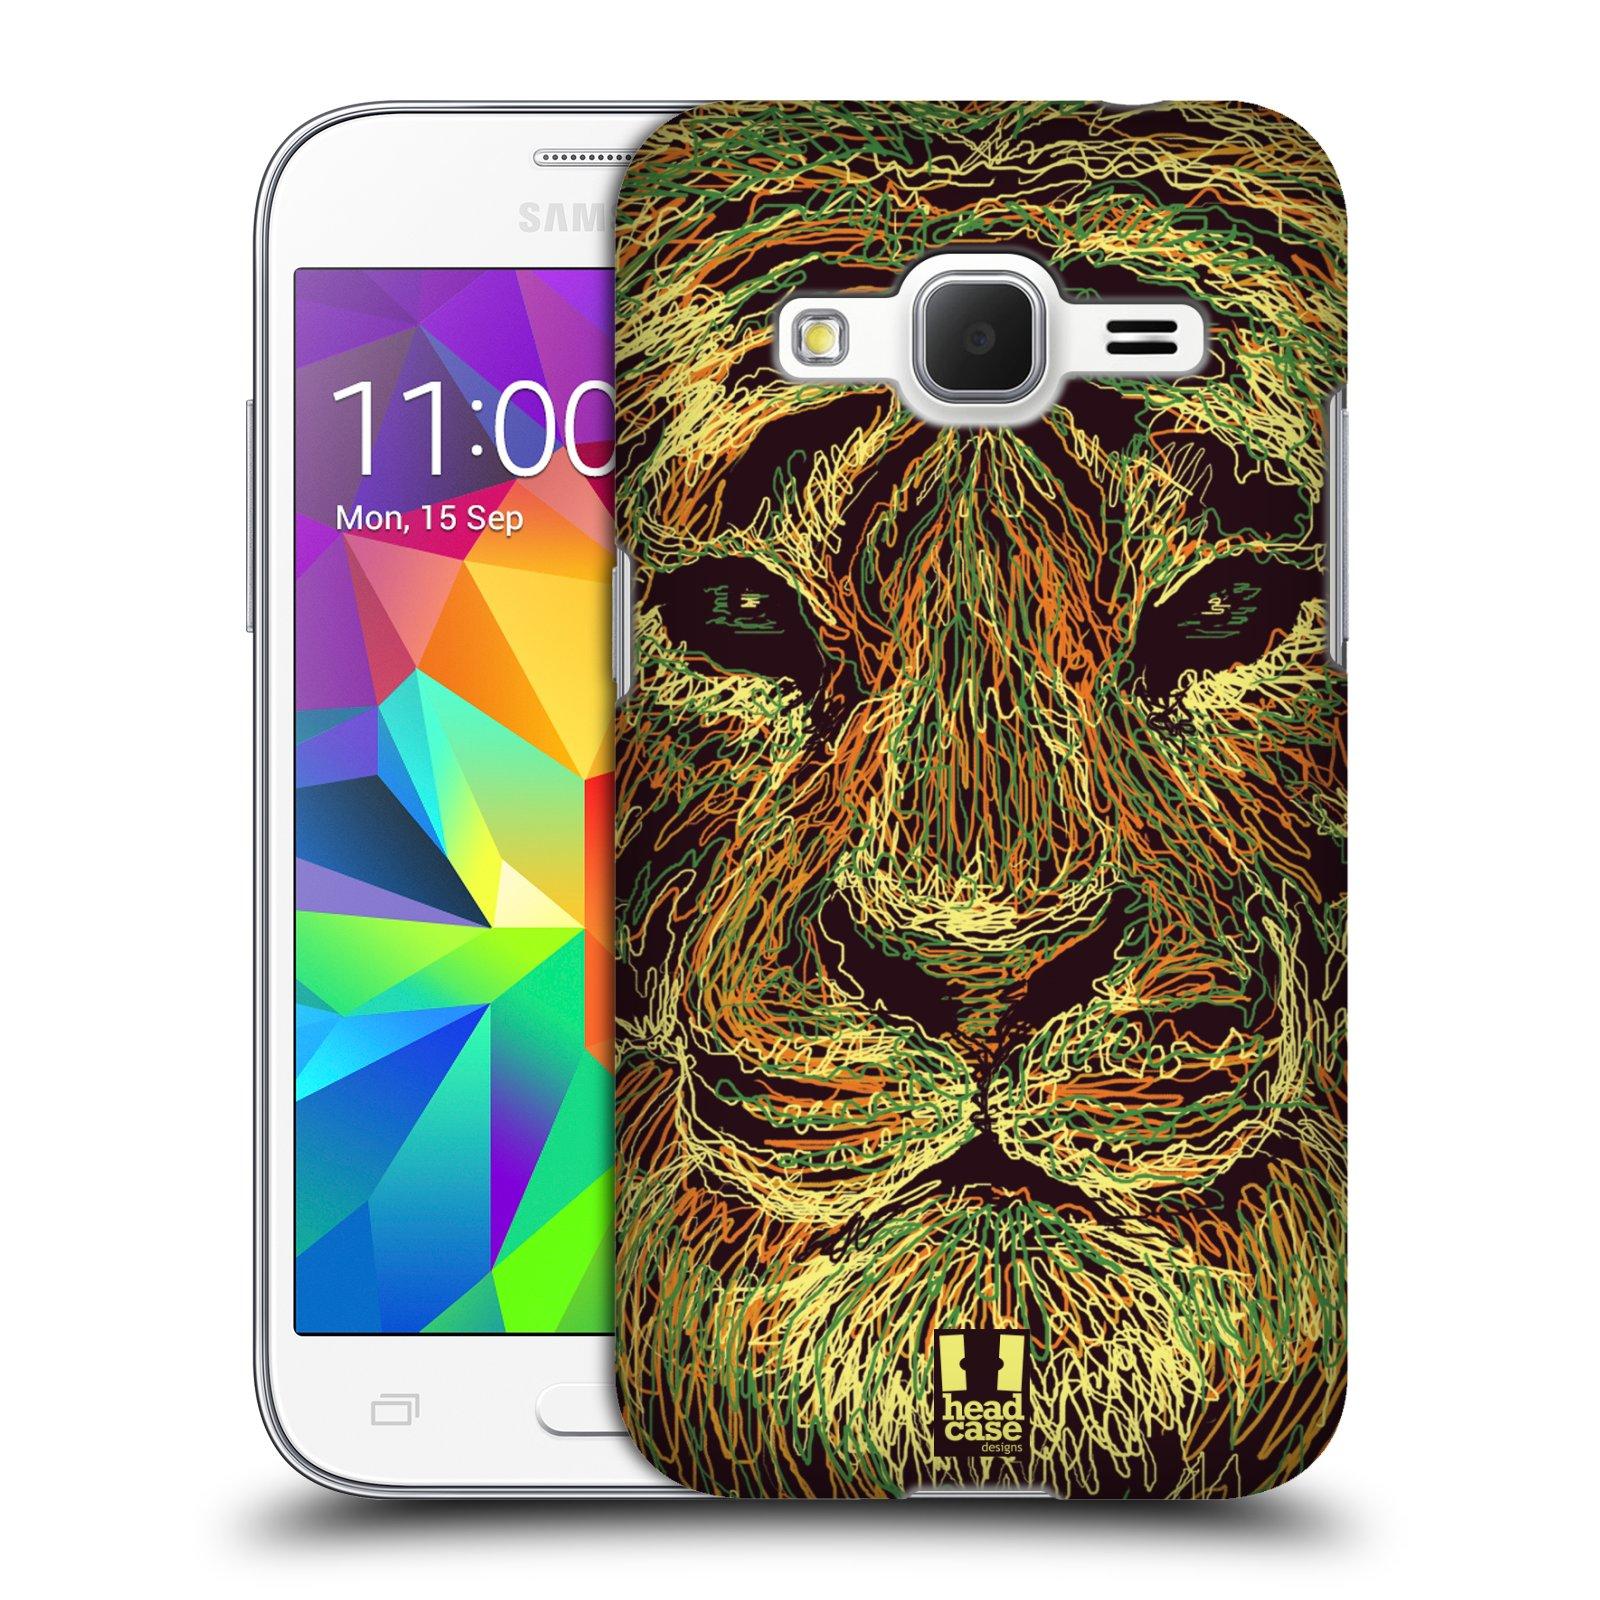 HEAD CASE plastový obal na mobil SAMSUNG GALAXY Core Prime (Core Prime VE) vzor zvíře čmáranice tygr